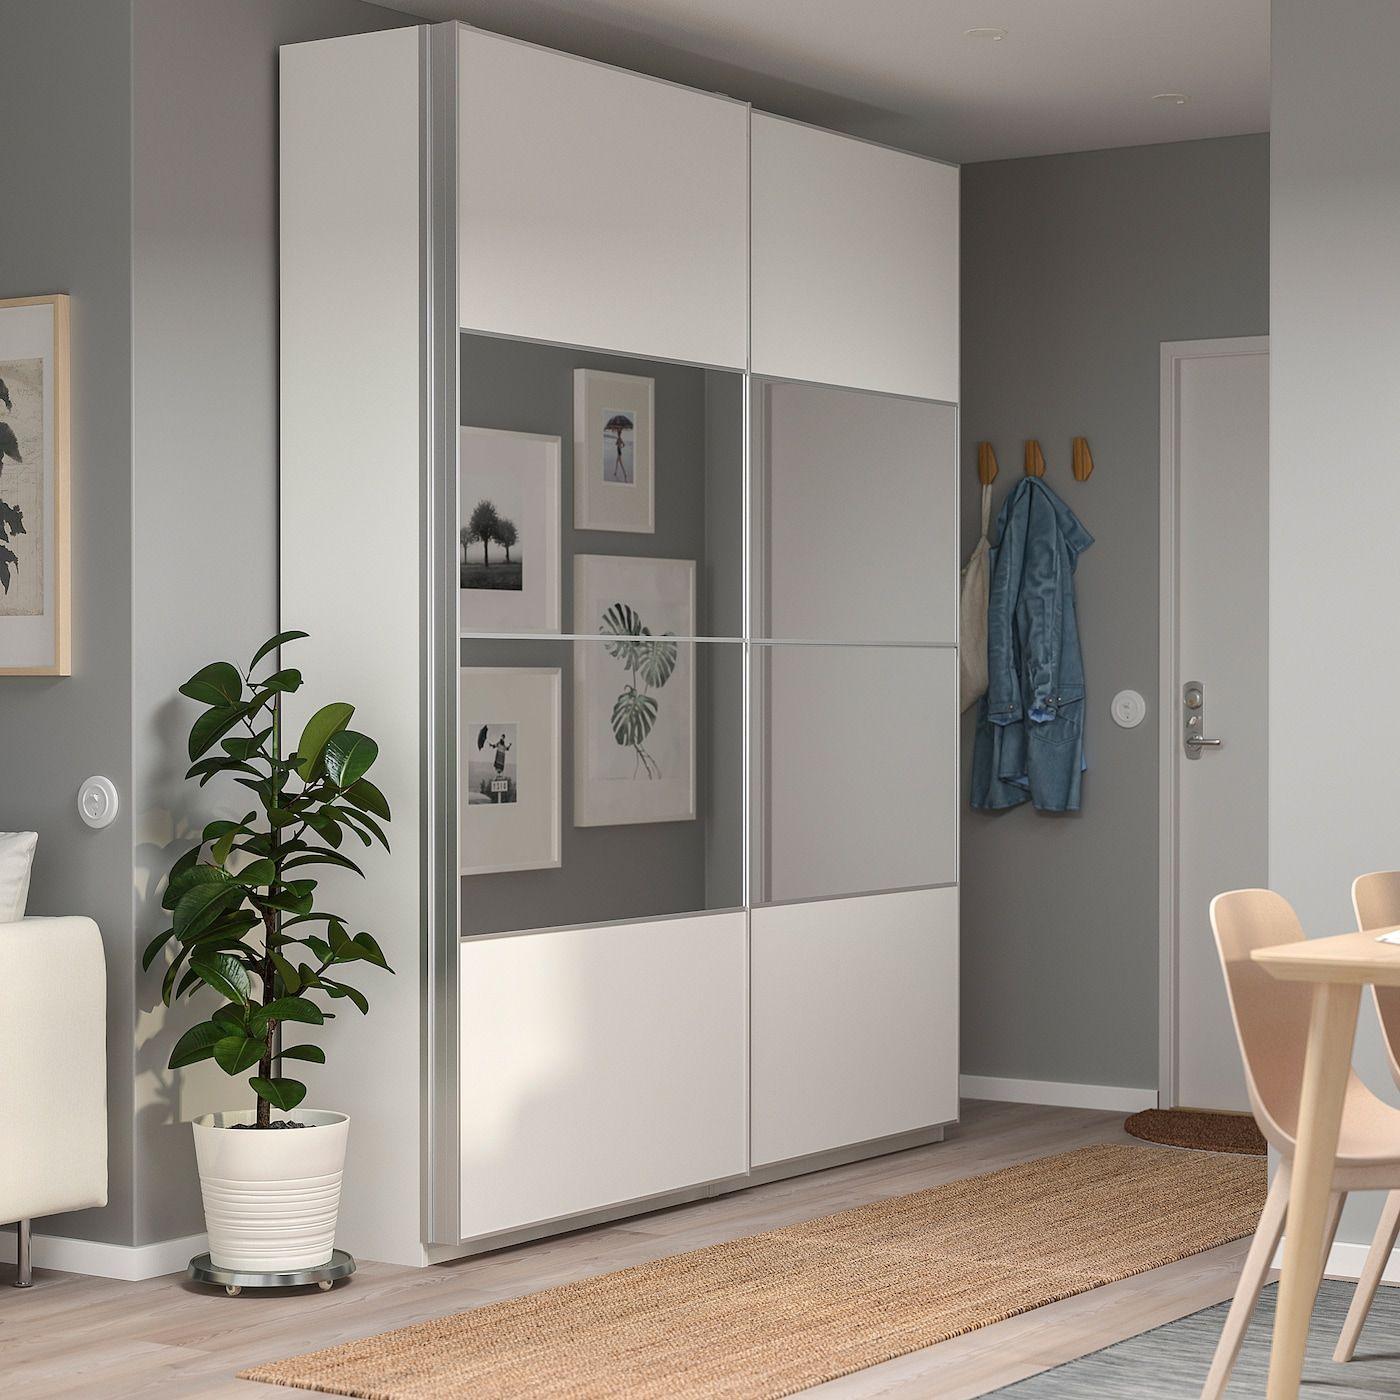 IKEA PAX Wardrobe white, Mehamn Auli in 2020 Pax